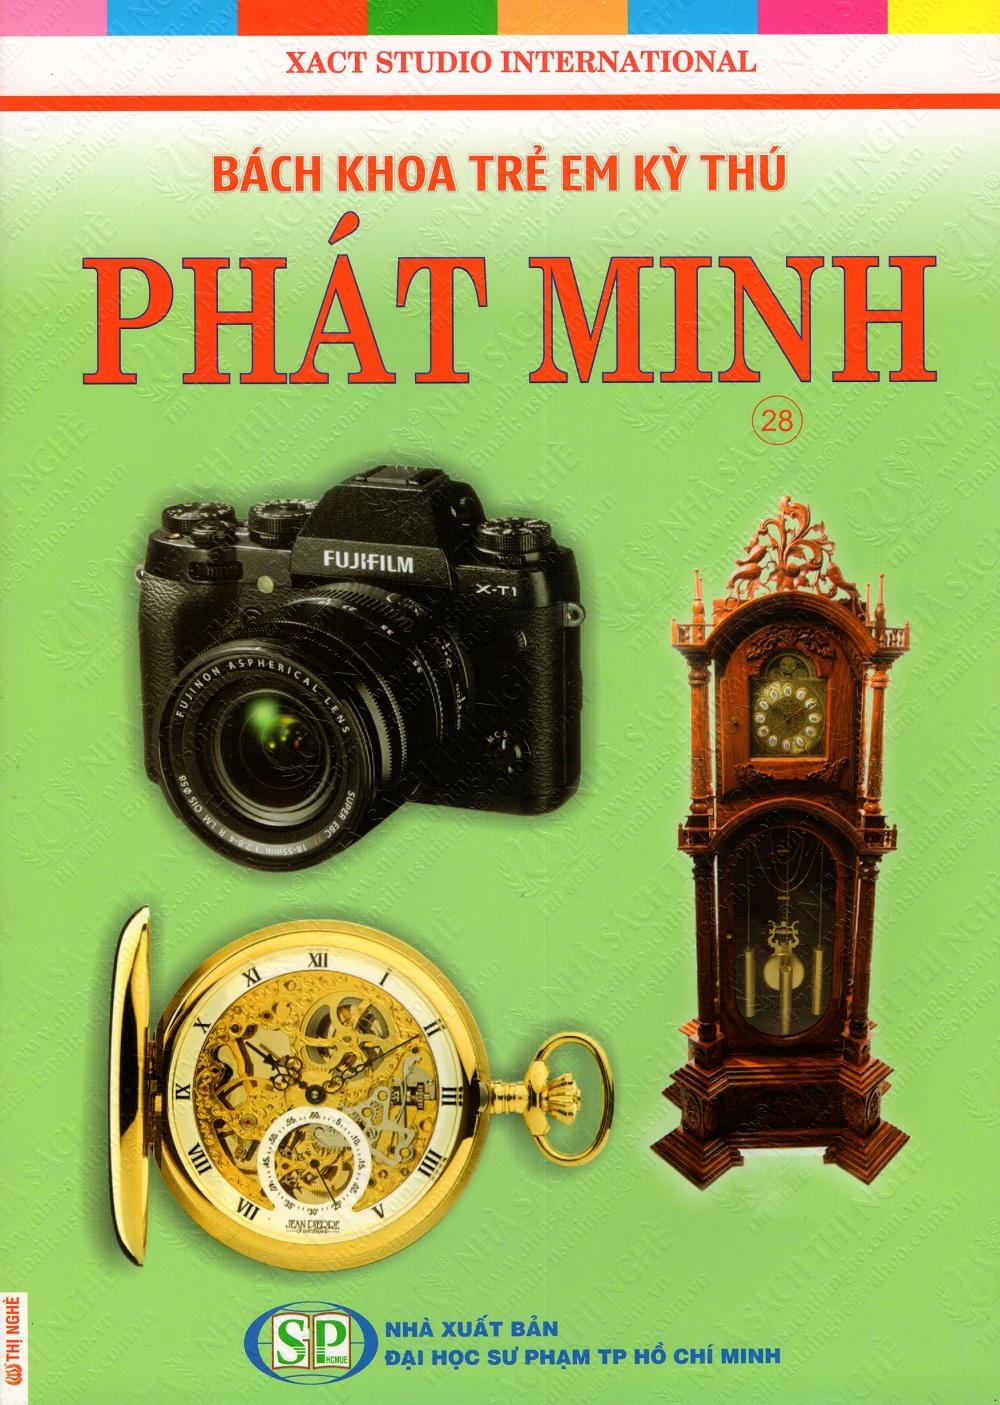 Bìa sách Bách Khoa Trẻ Em Kỳ Thú - Phát Minh (28)